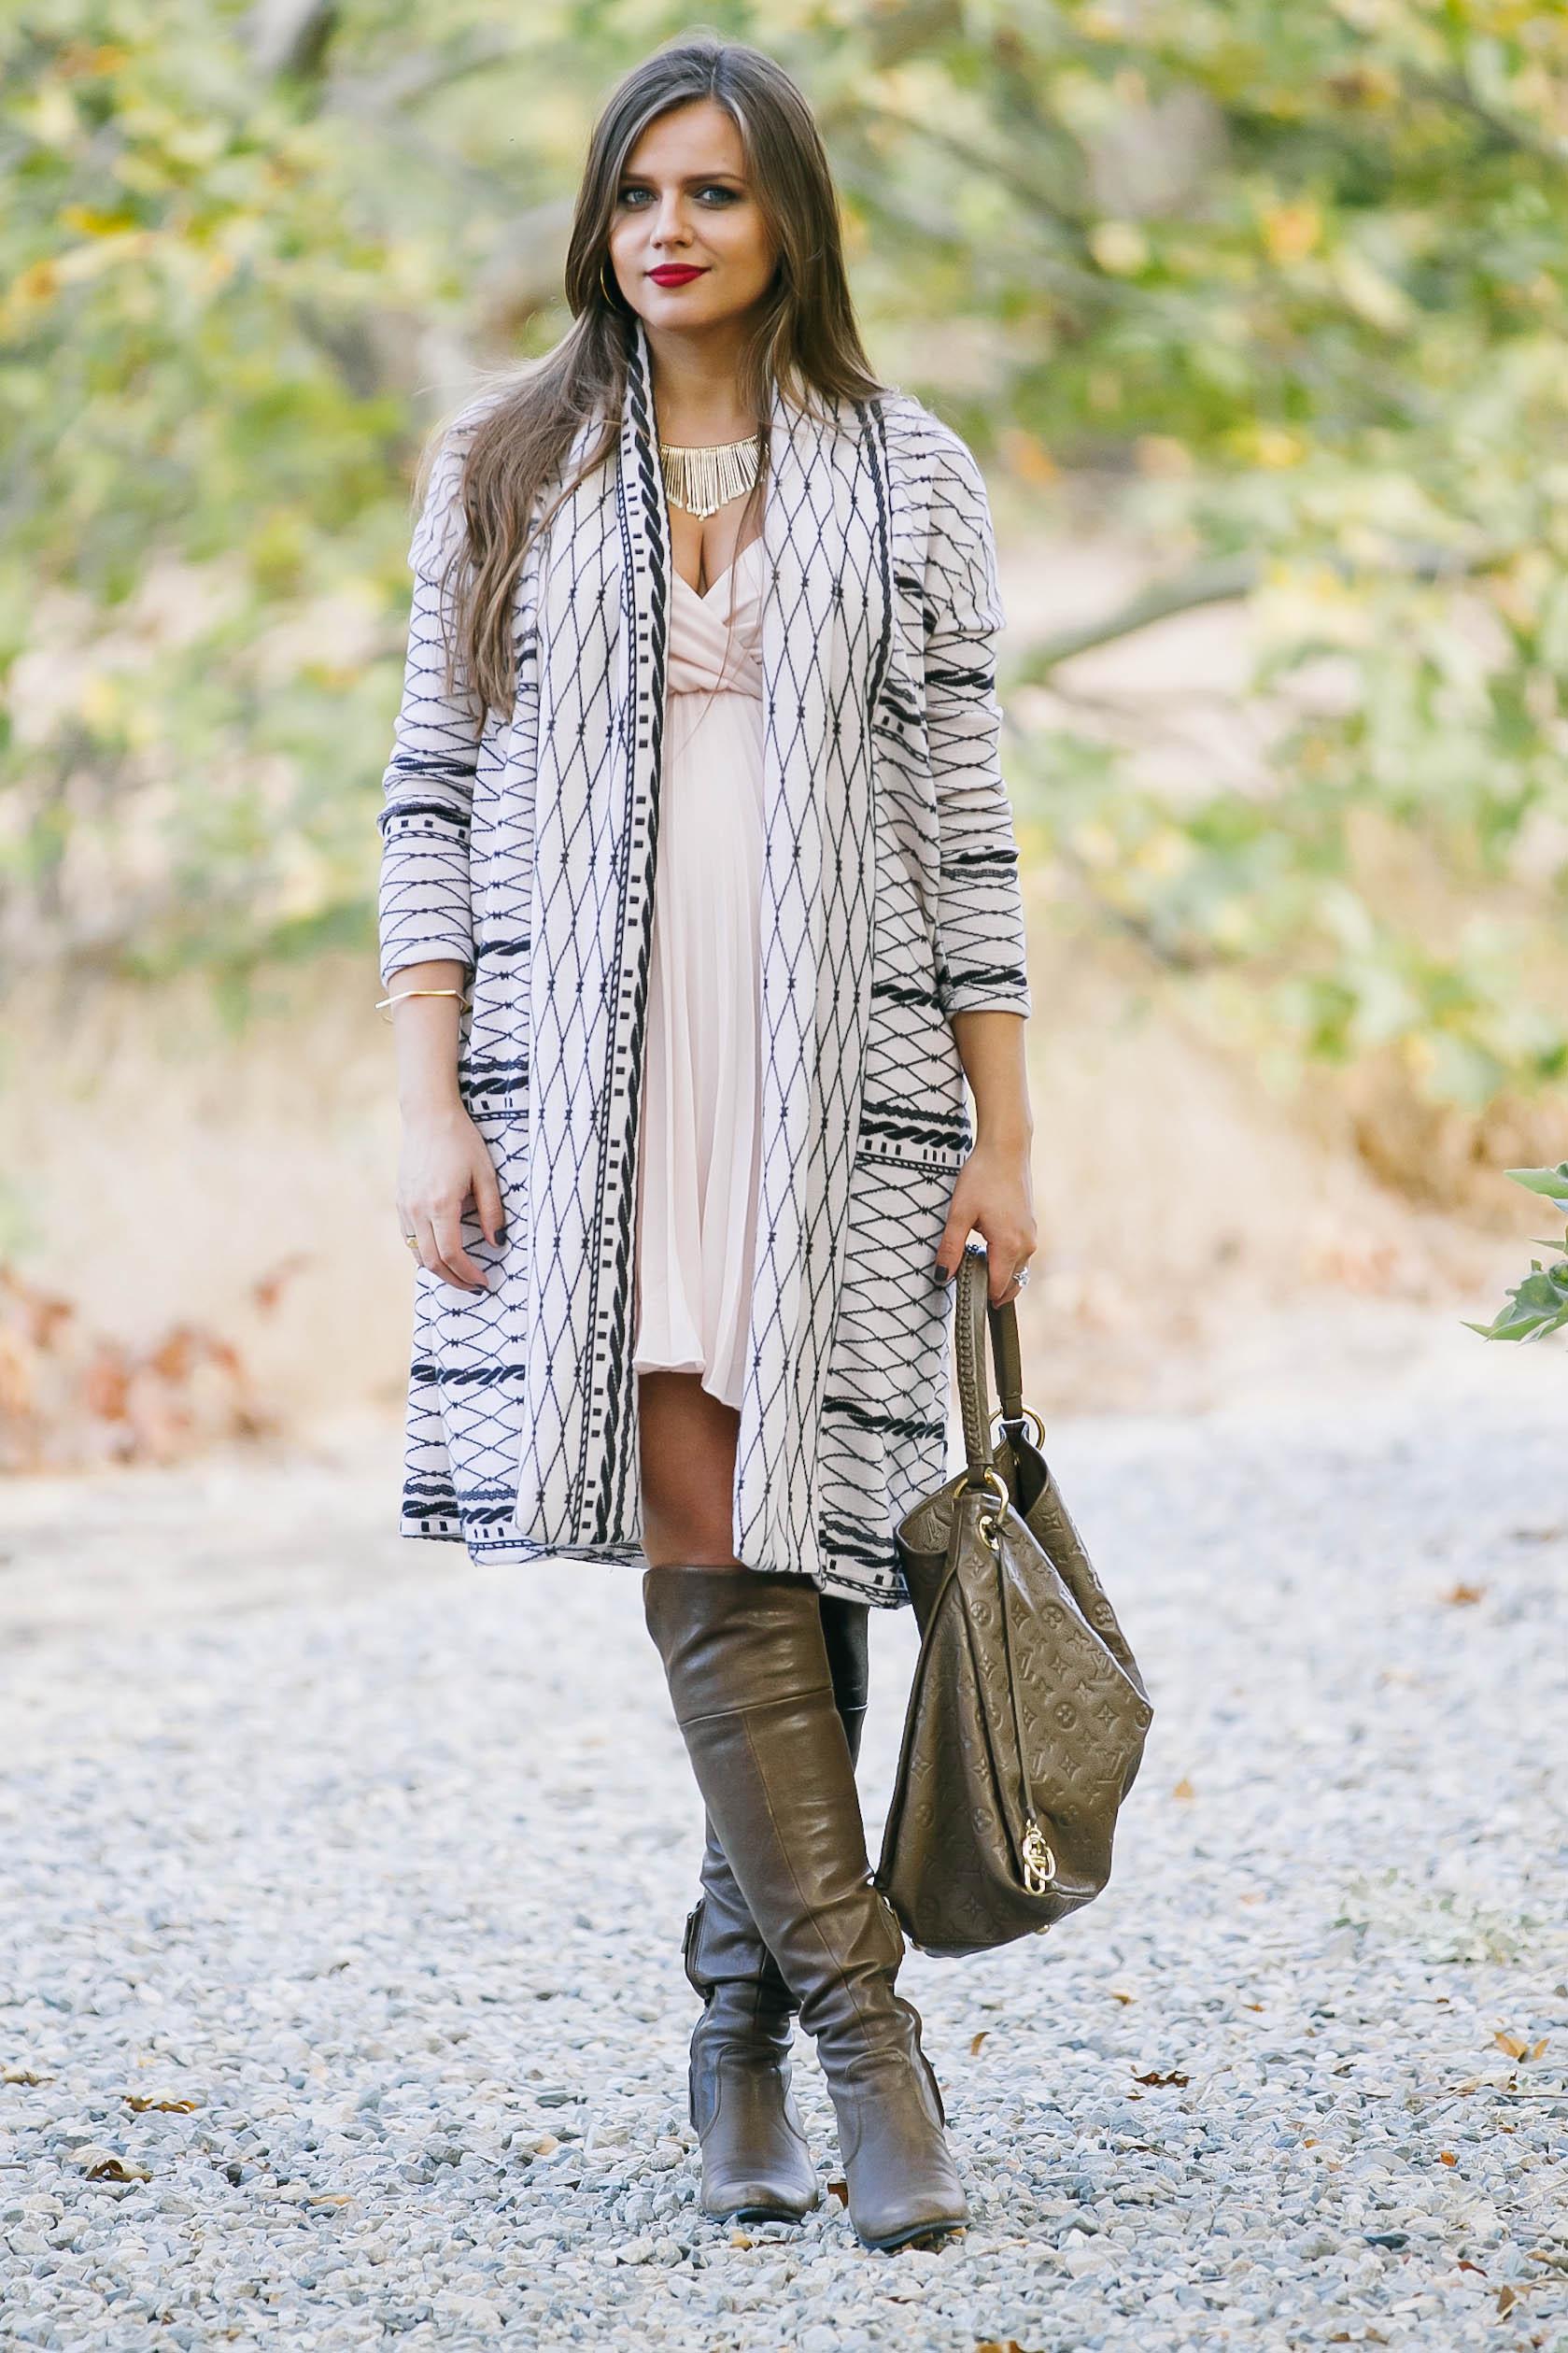 Bumpstyle Long Cardigan Pleated Grecian Dress A Fashion Baby Gear